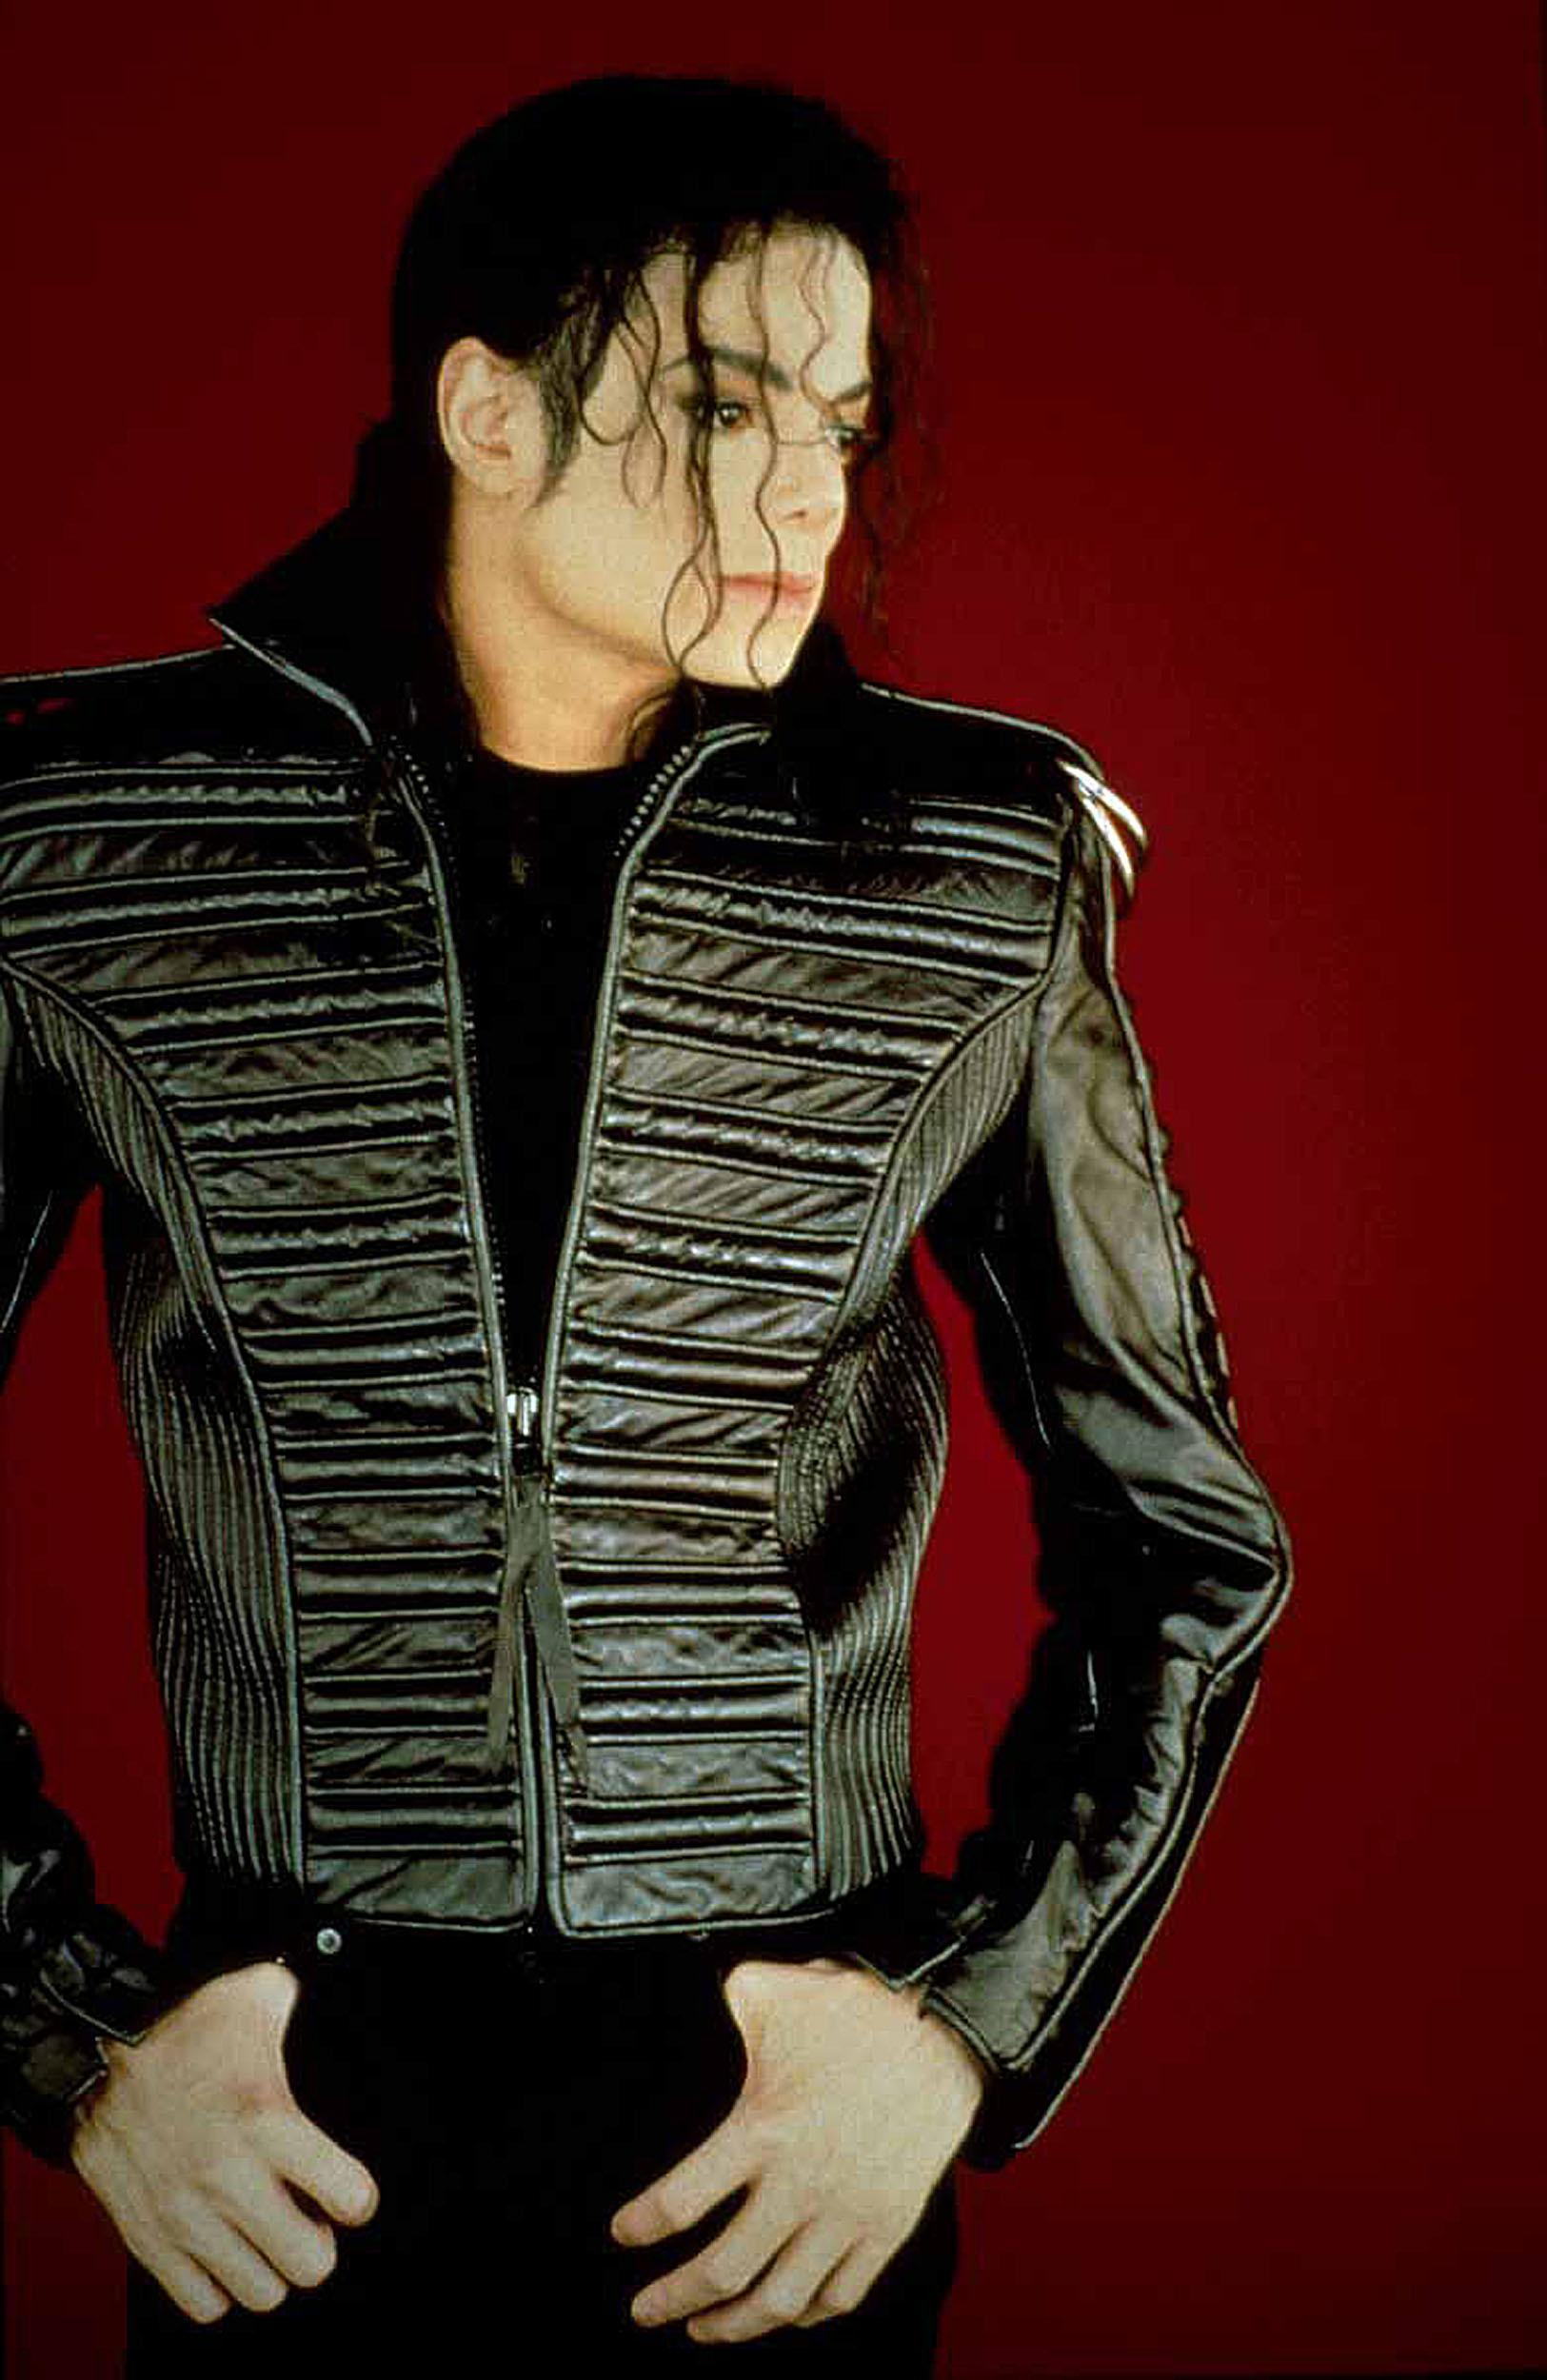 Pochette Bad Michael Jackson